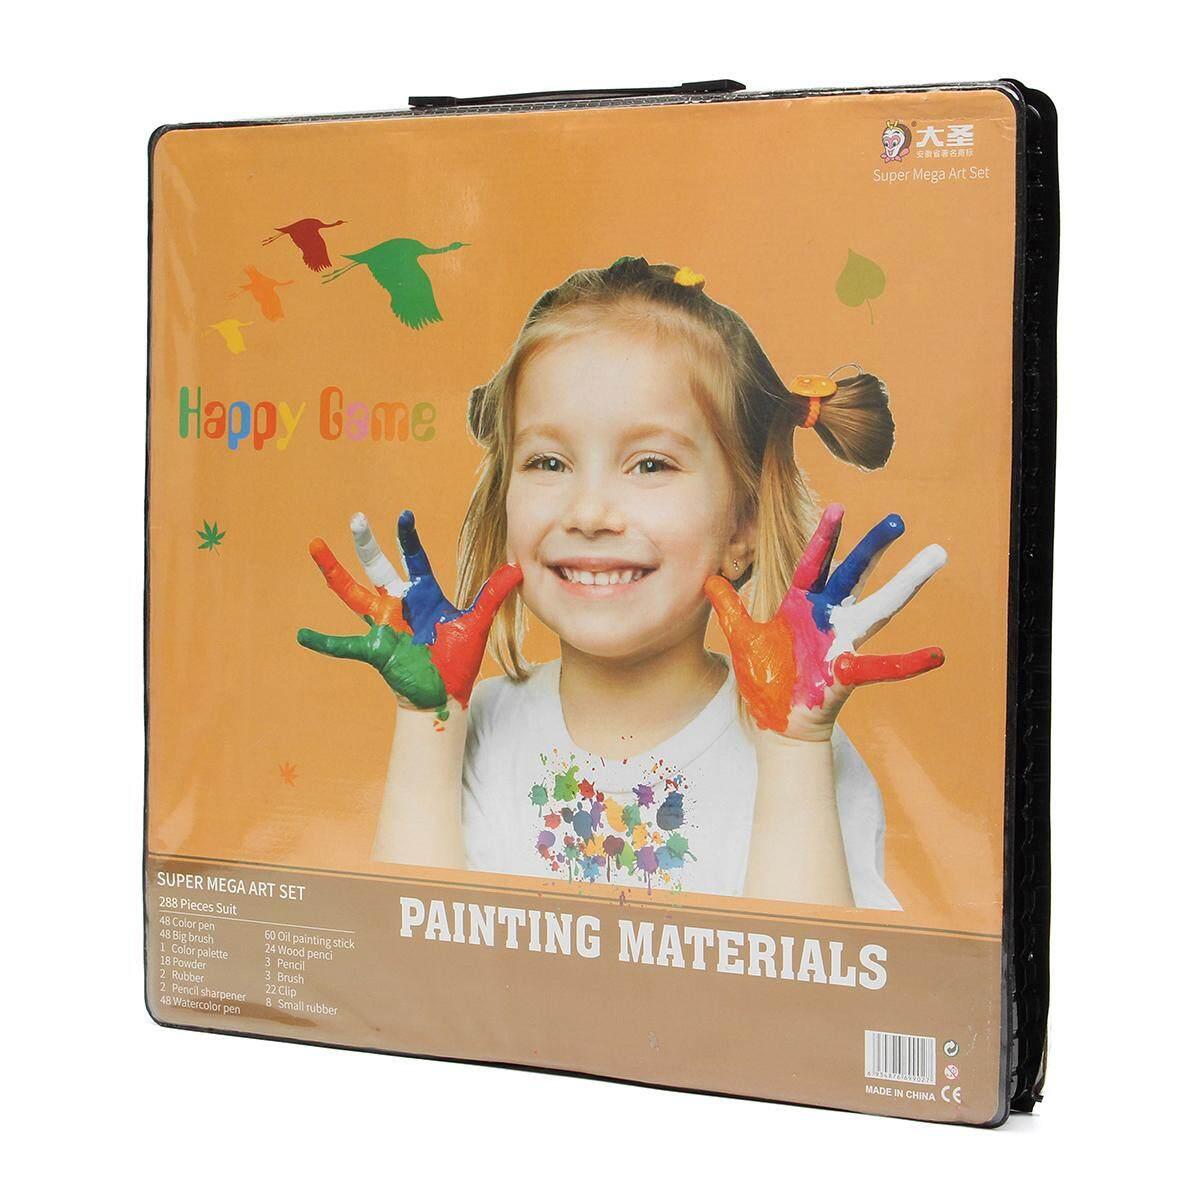 ... 288 Pcs Lengkap Cat Gambar Seni Perlengkapan Cat Air Cat Crayons Pensil Warna-Internasional ...